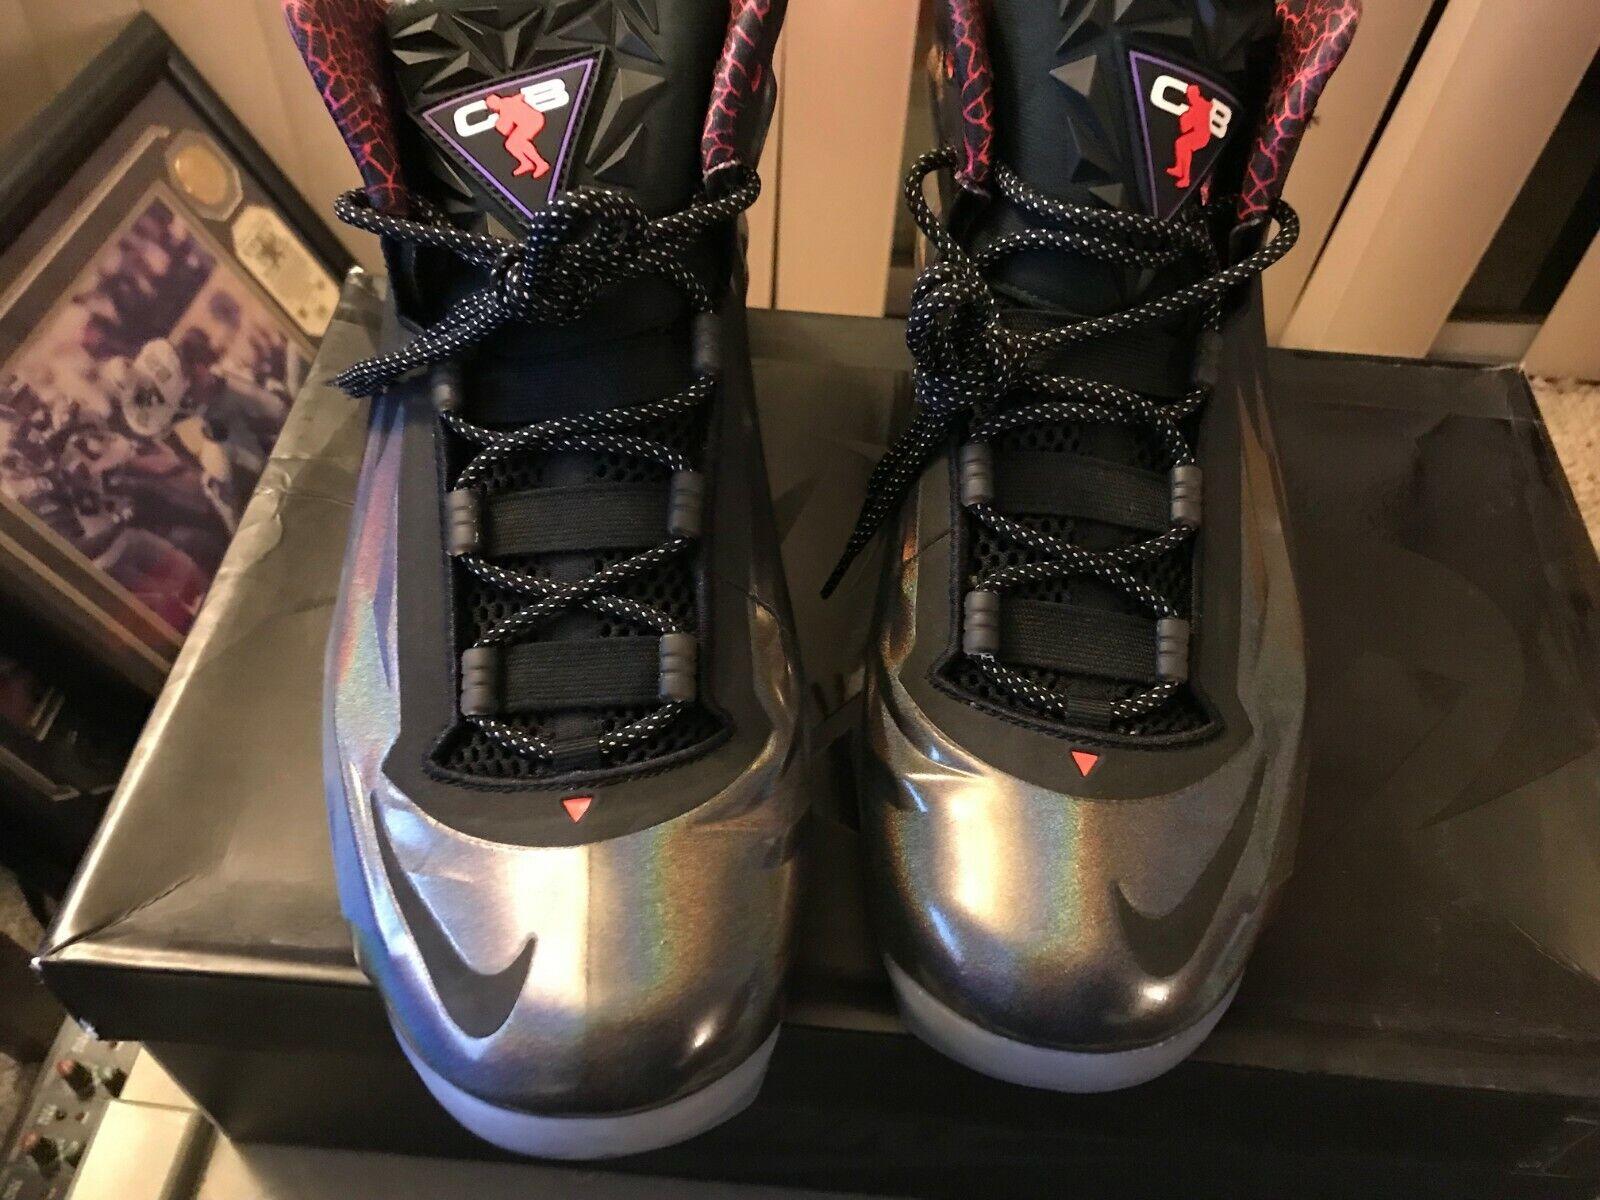 Nike Chuck Posite Charles Barkley Purple Haze Black shoes Size 11 684758-501